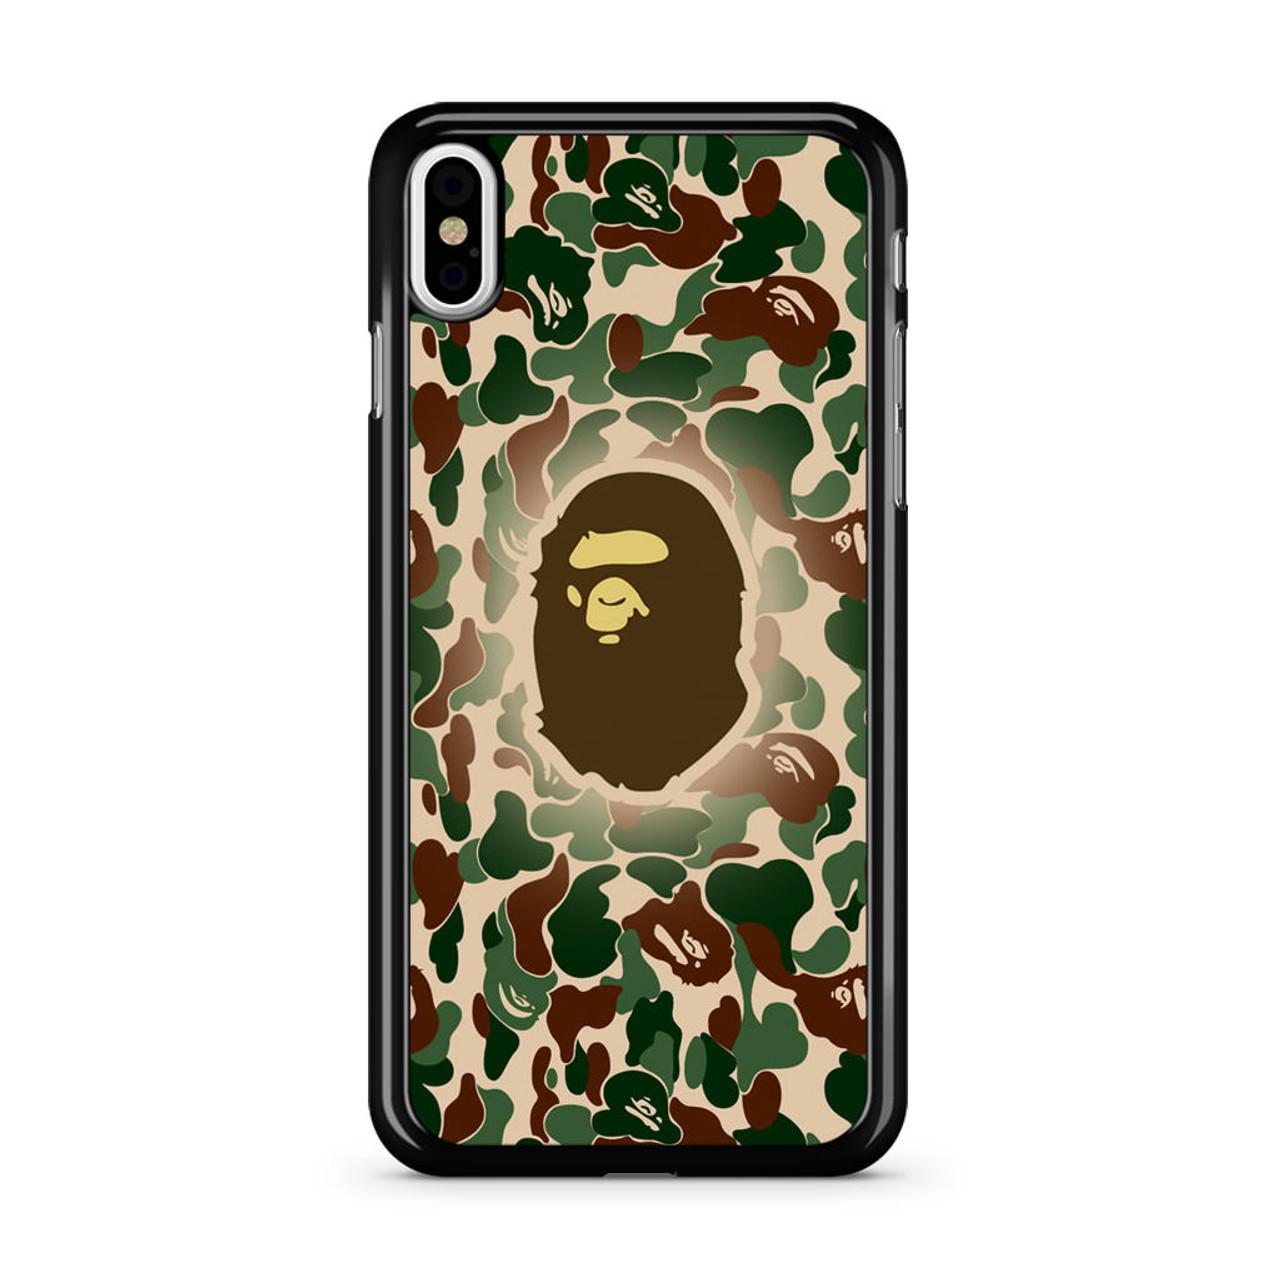 timeless design 7aaff 339a6 Bathing Ape Bape Camo iPhone X Case